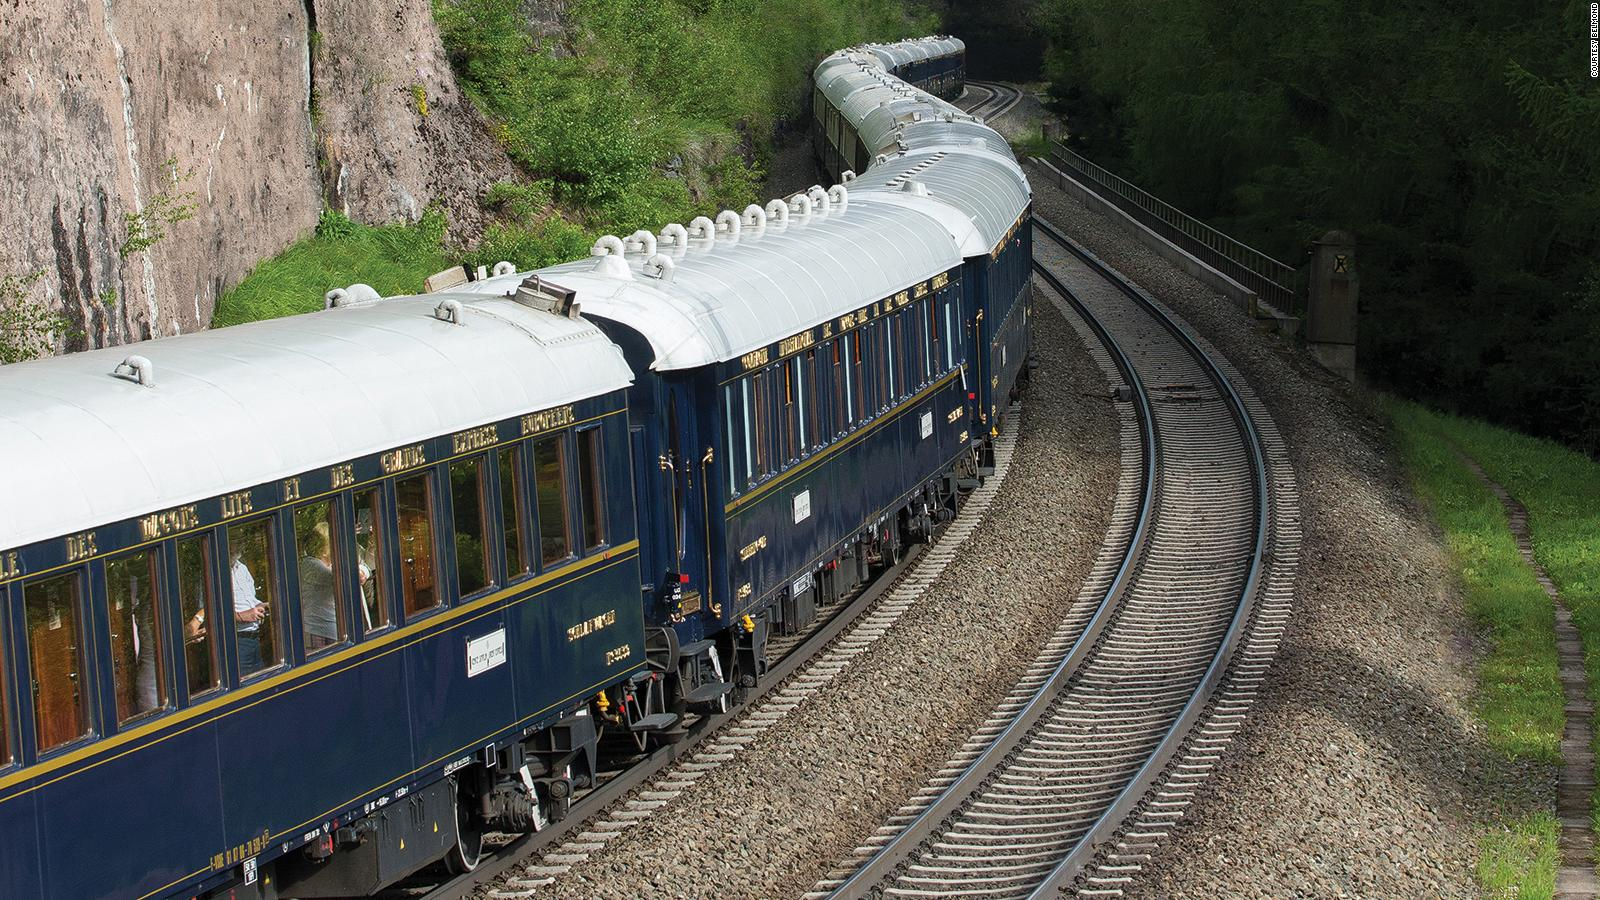 simplon orient express train